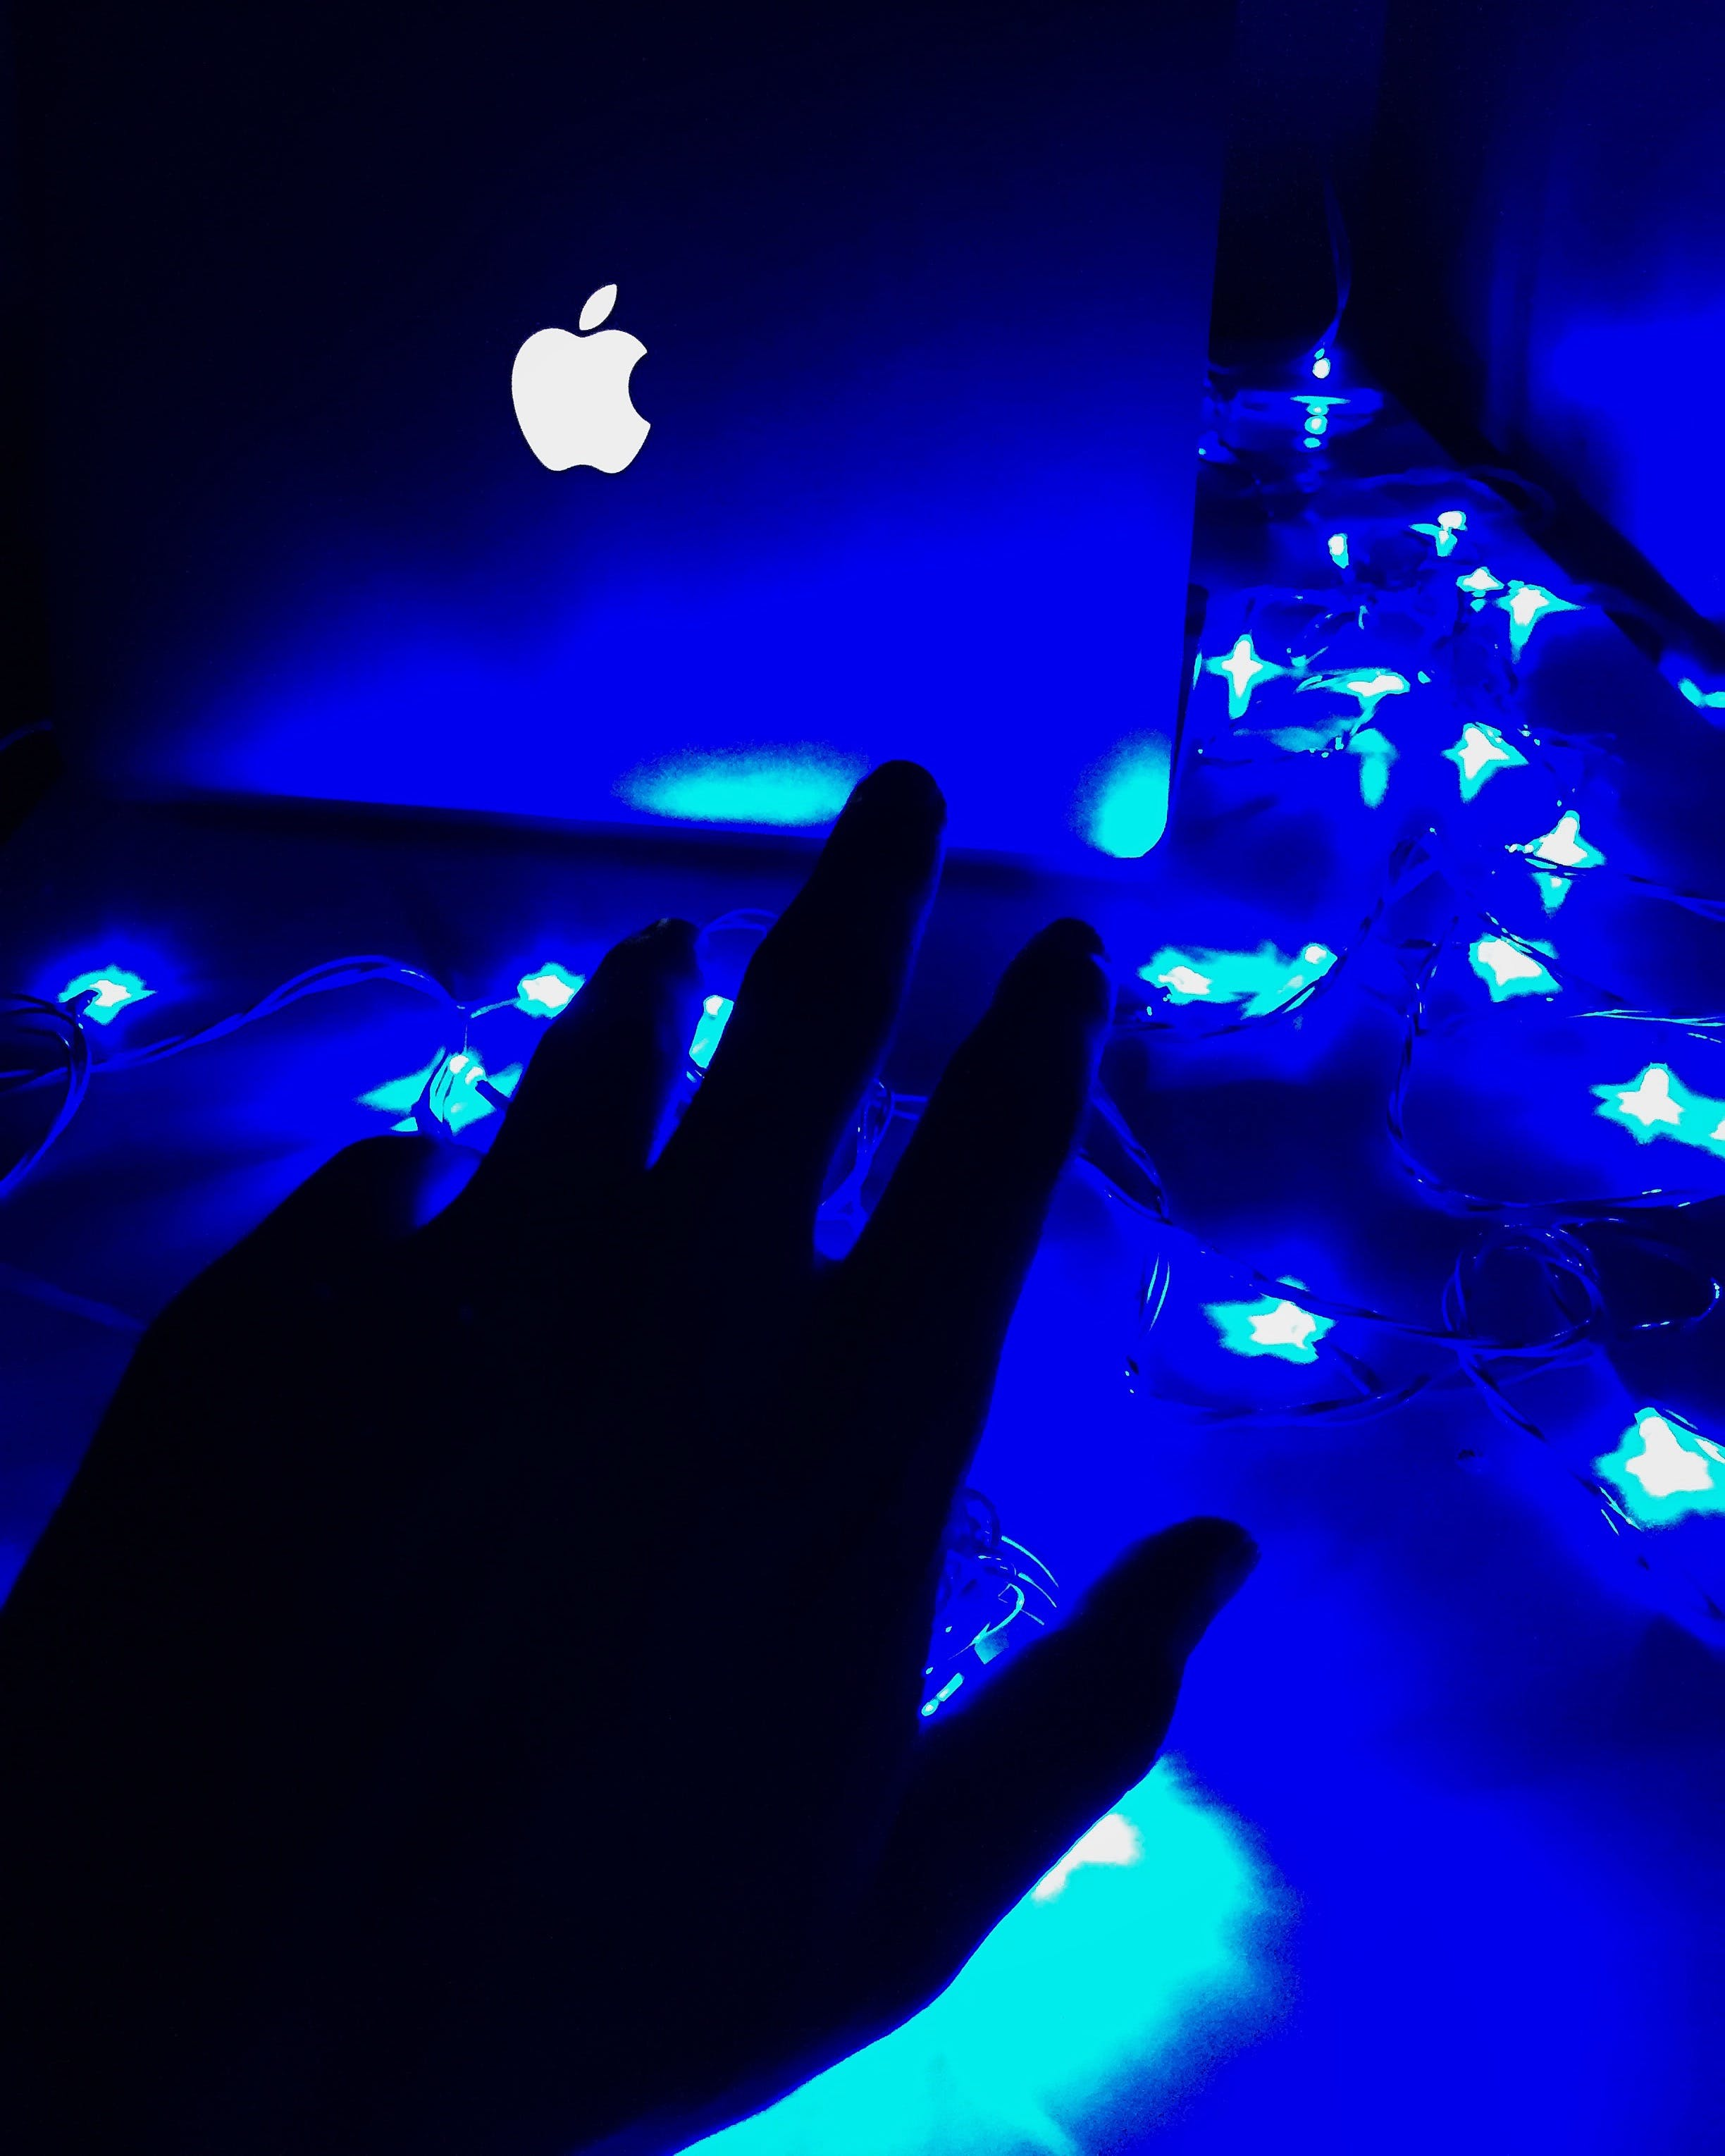 LED 조명, 가벼운, 기술, 노트북의 무료 스톡 사진